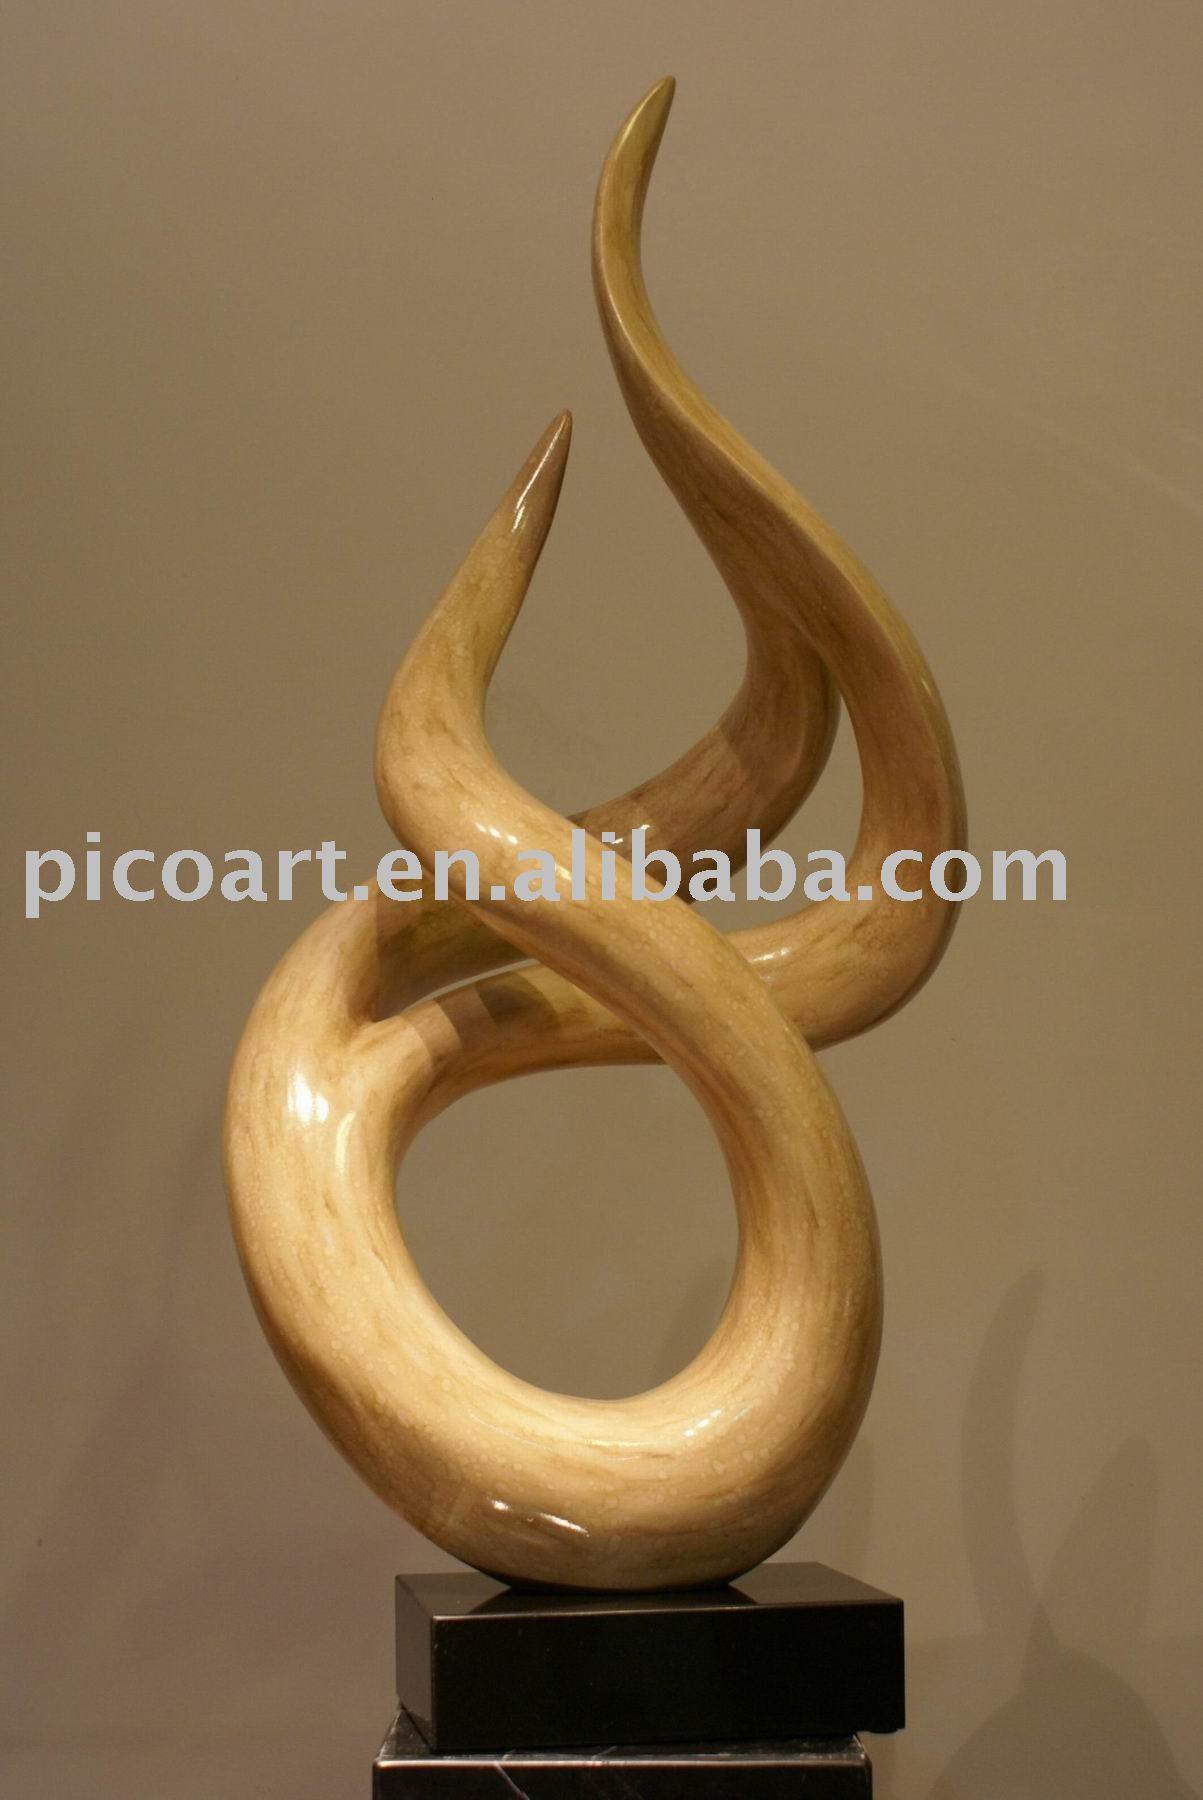 fiberglass sculptor